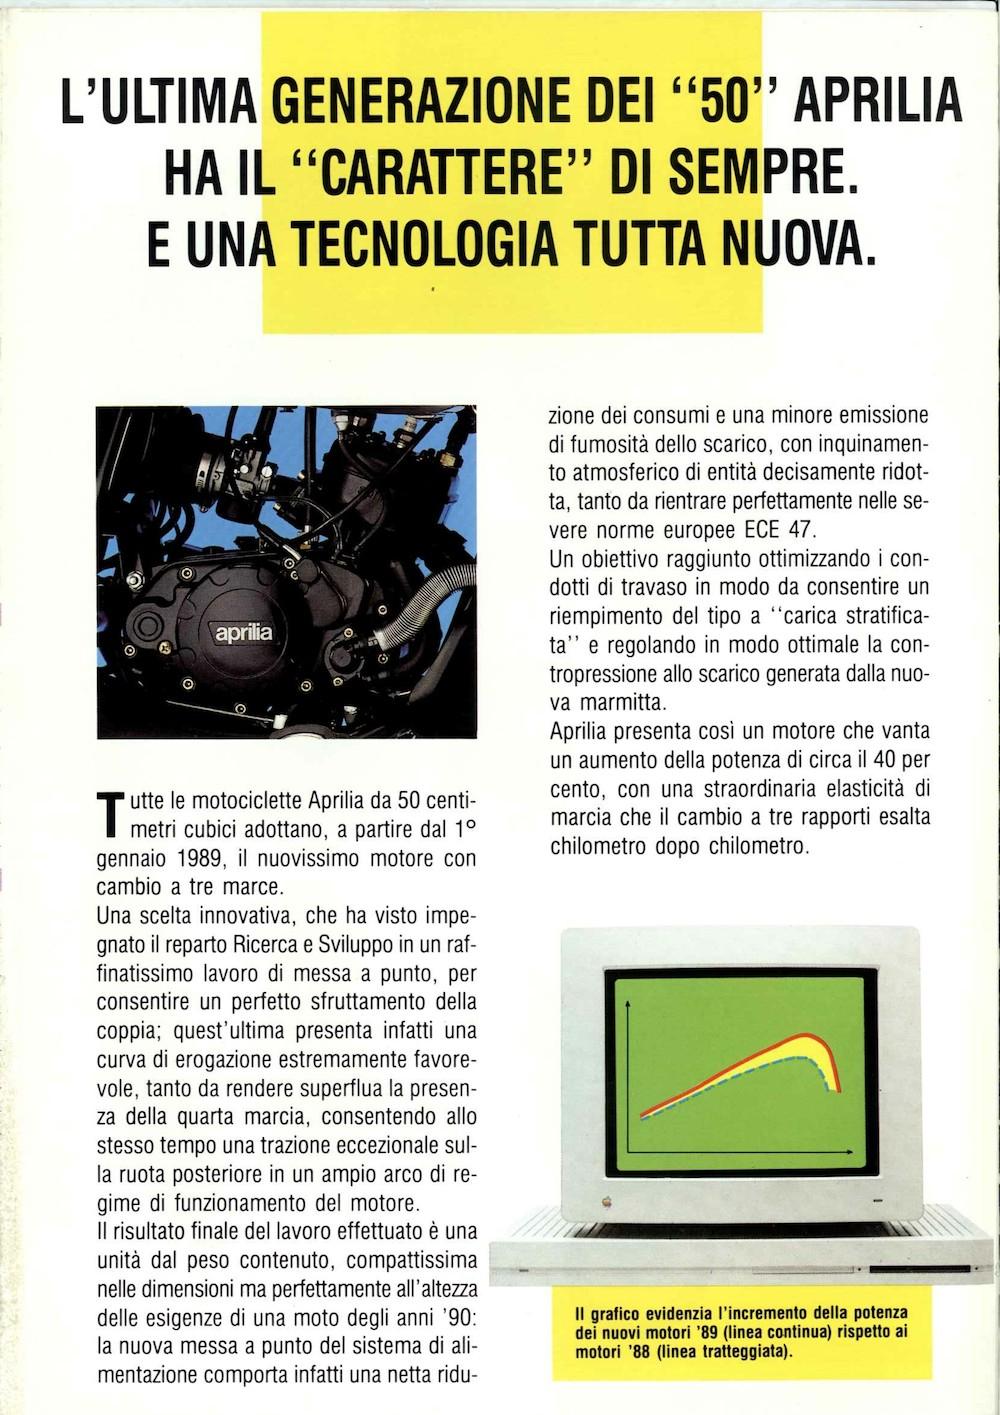 Catalogo Aprilia 50 1989 (3)